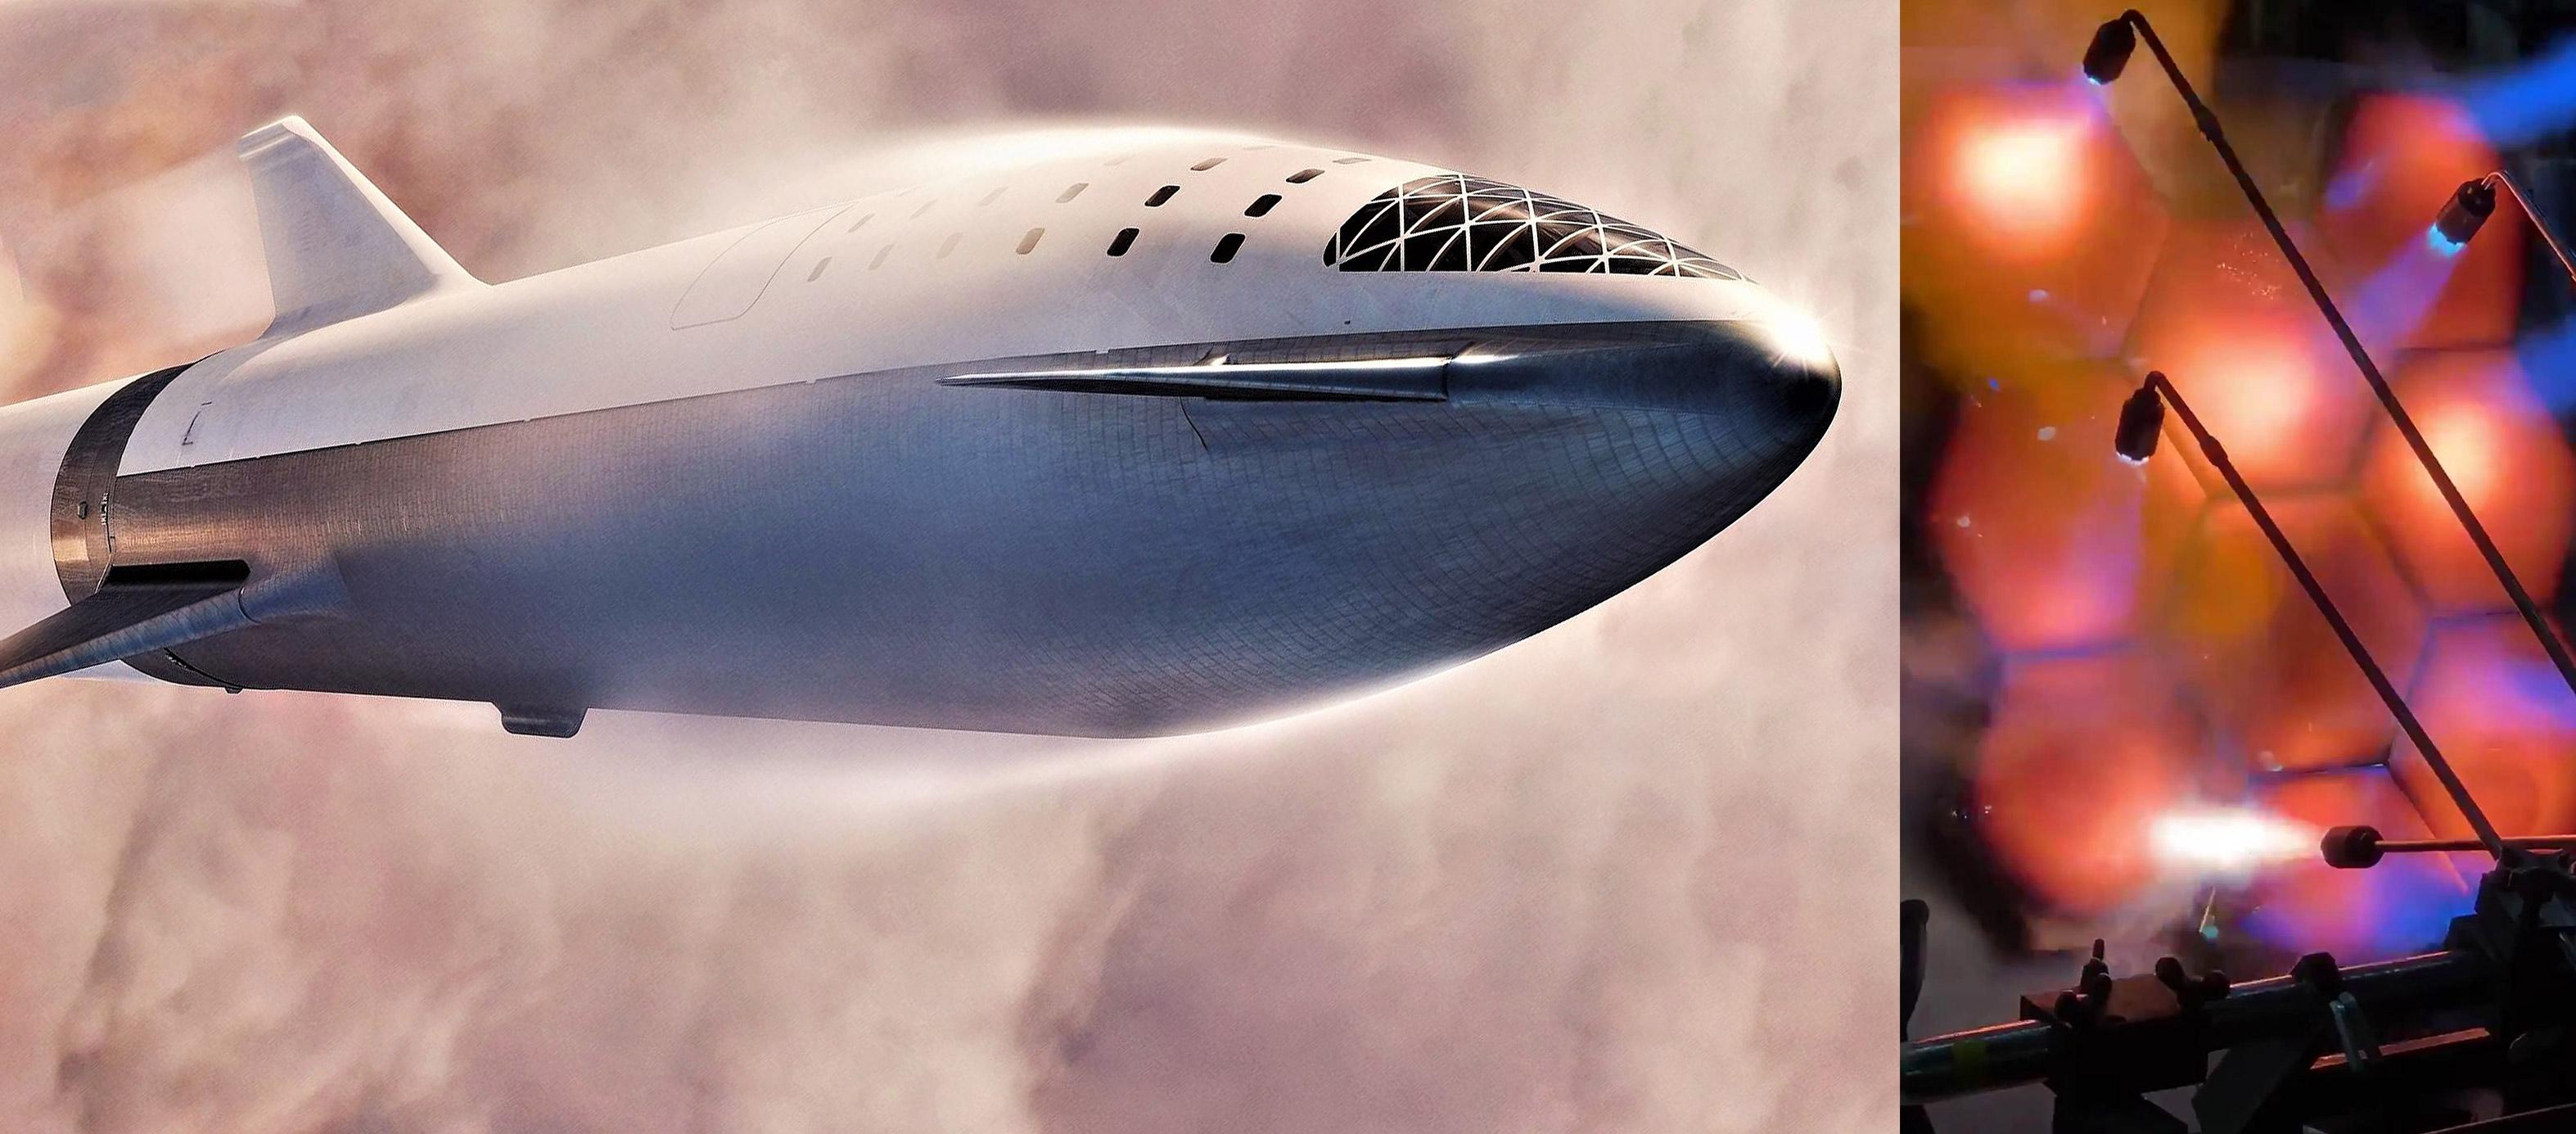 Starship hexagonal heat shield tile testing + BFS 031719 (Elon Musk – SpaceX) 1